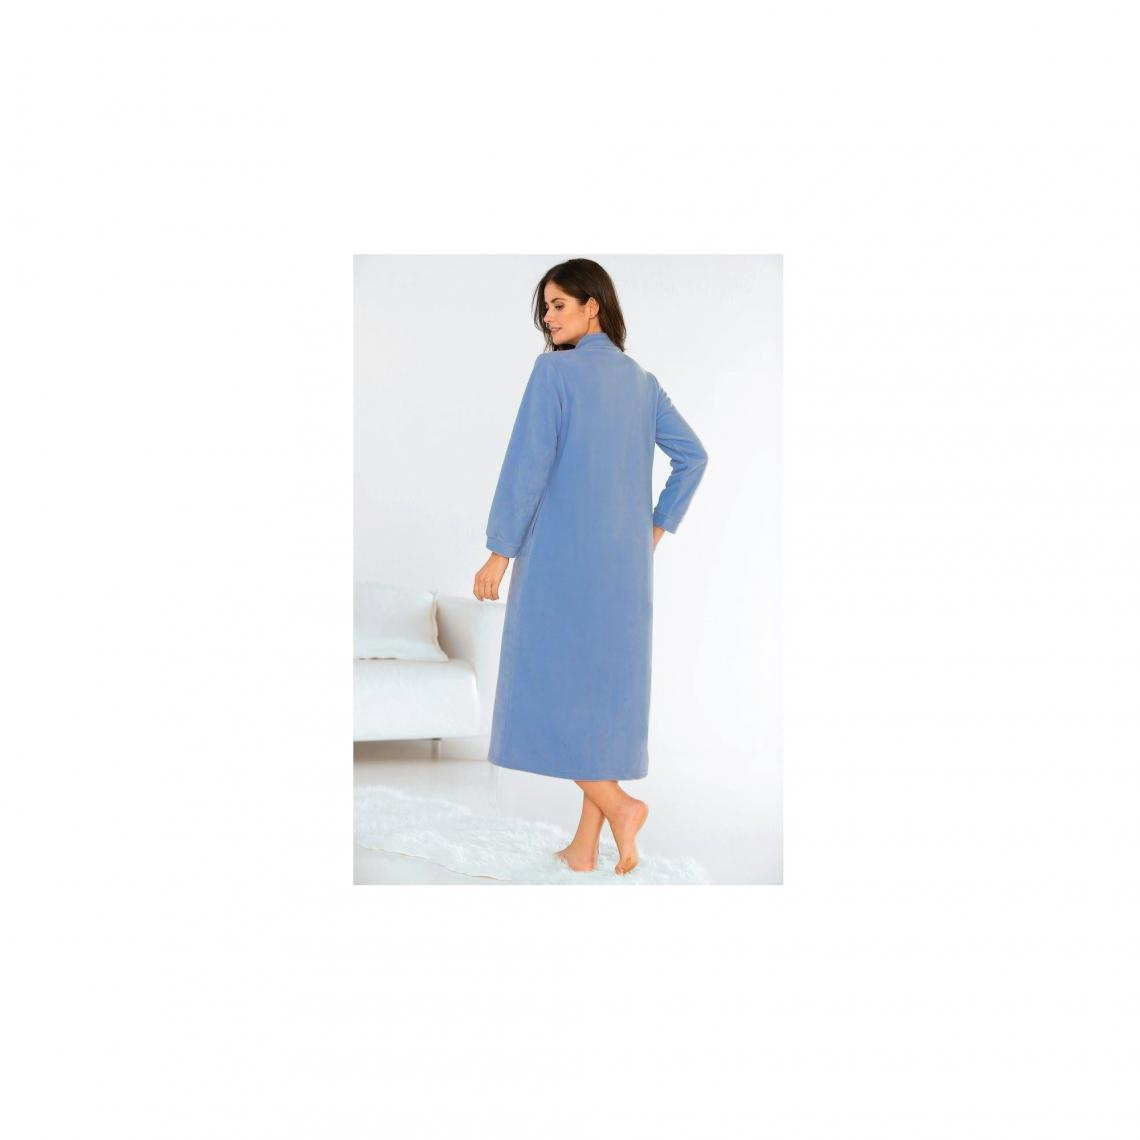 Robe De Chambre Polaire Zippée Avec Broderie Femme Bleu